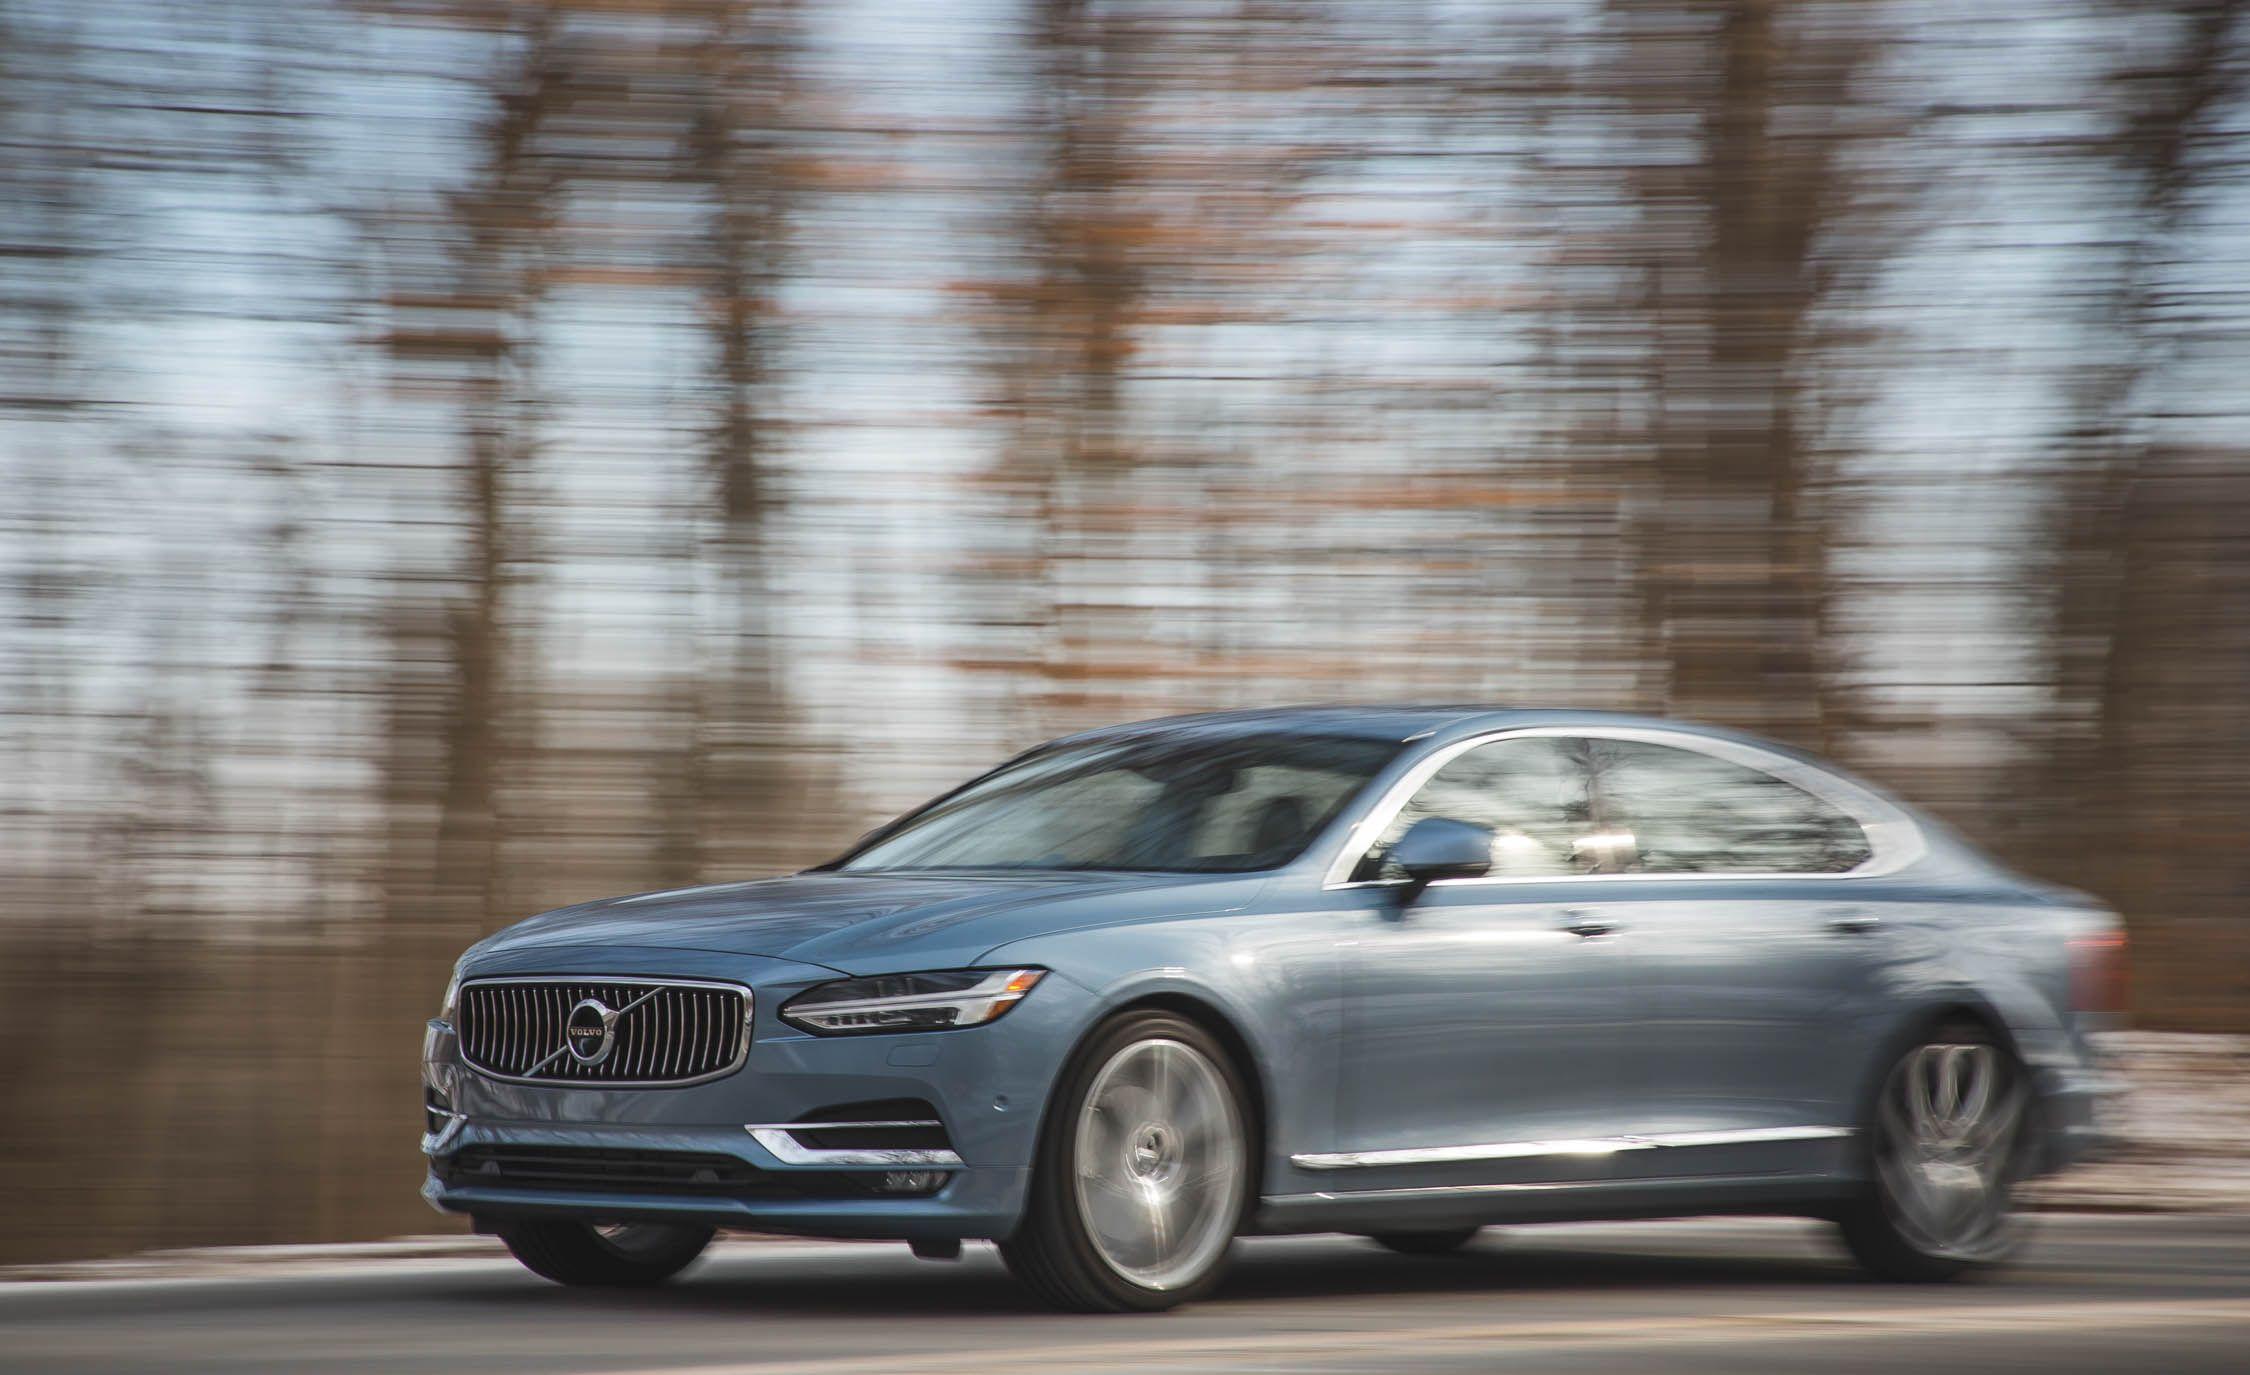 2019 Volvo S90 Reviews Volvo S90 Price Photos And Specs Car